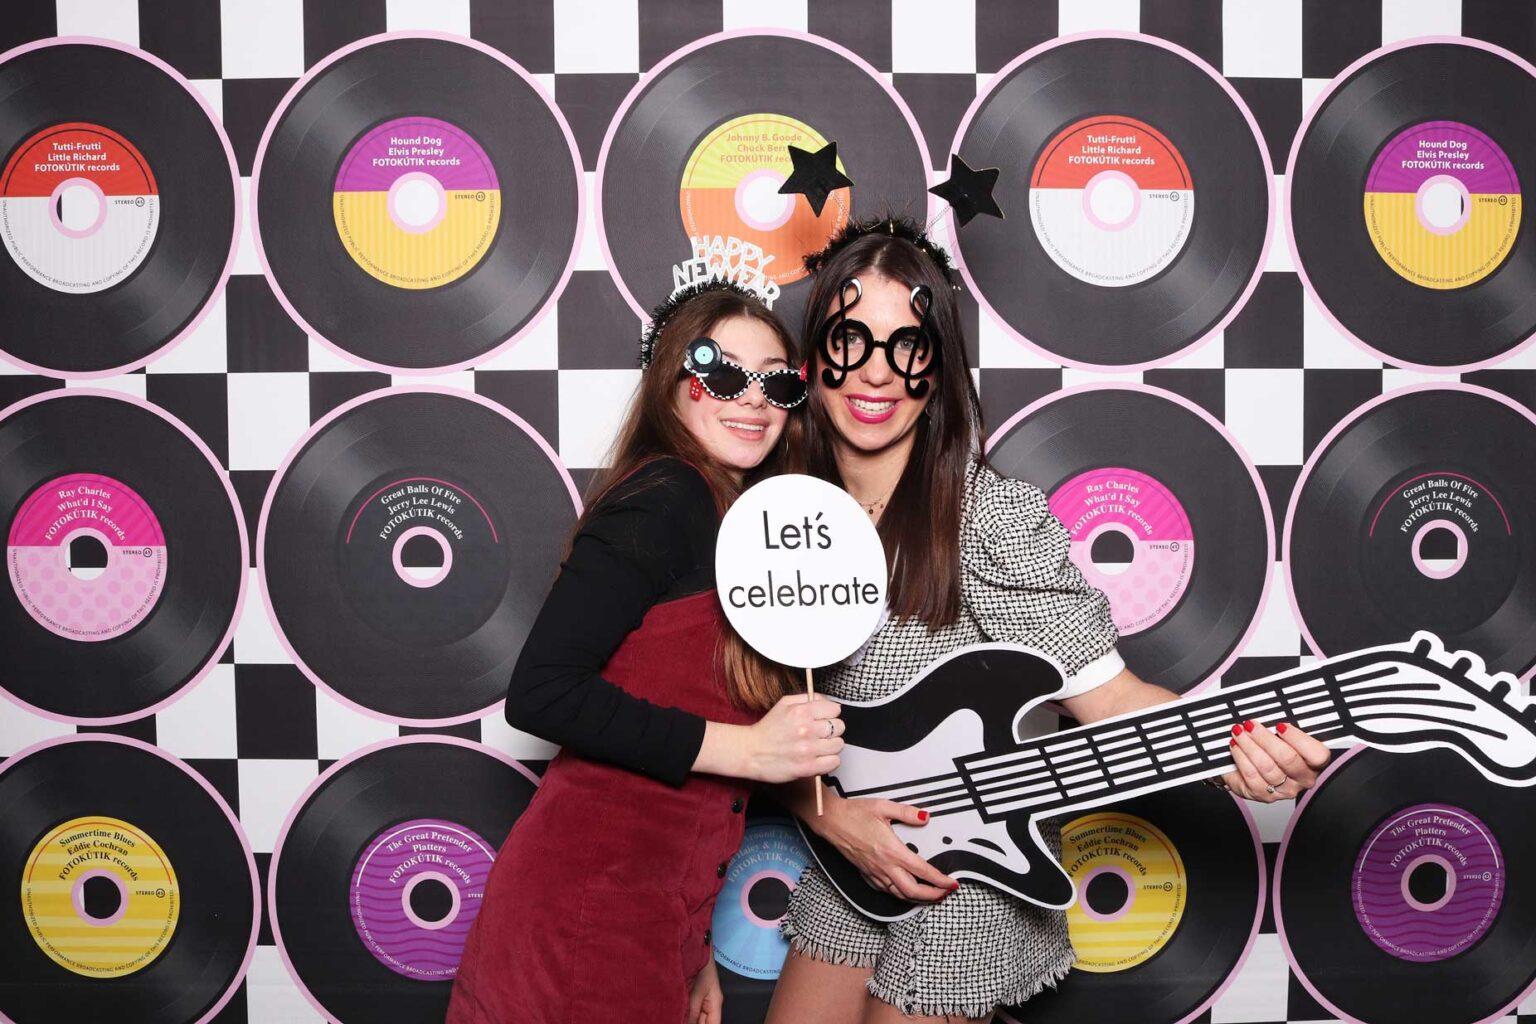 Rock n roll večierok - fotokútik - rekvizity, fotostena, pozadie.